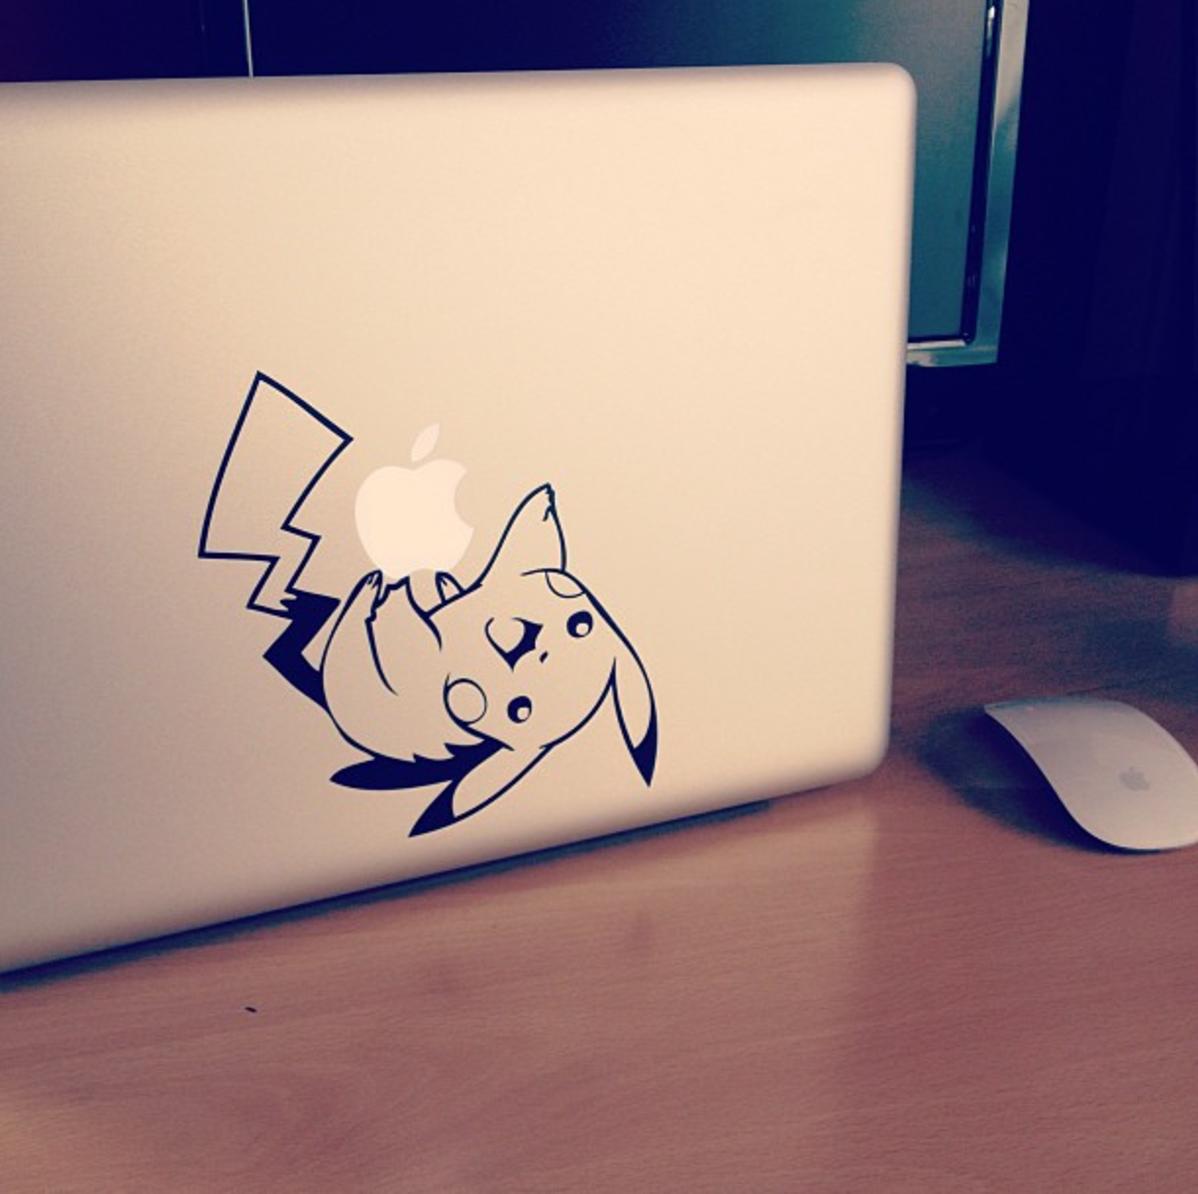 Pikachu Pokemon Macbook Decal | Customer Photos | Macbook decal